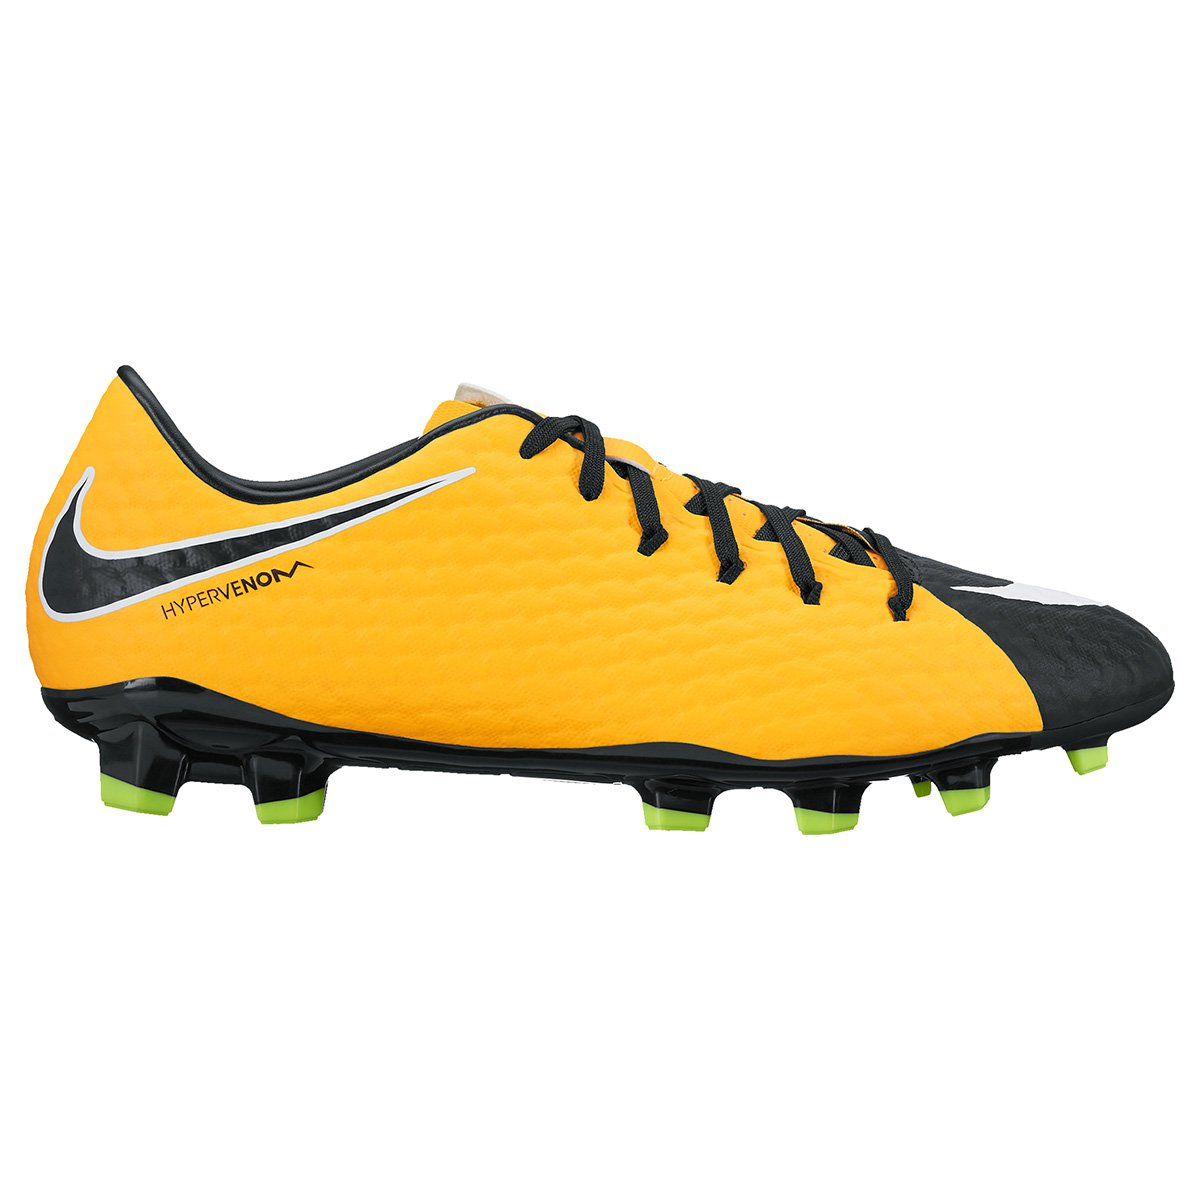 d2aecf3e81 Chuteira Campo Nike Hypervenom Phelon 3 FG - Laranja e Preto ...